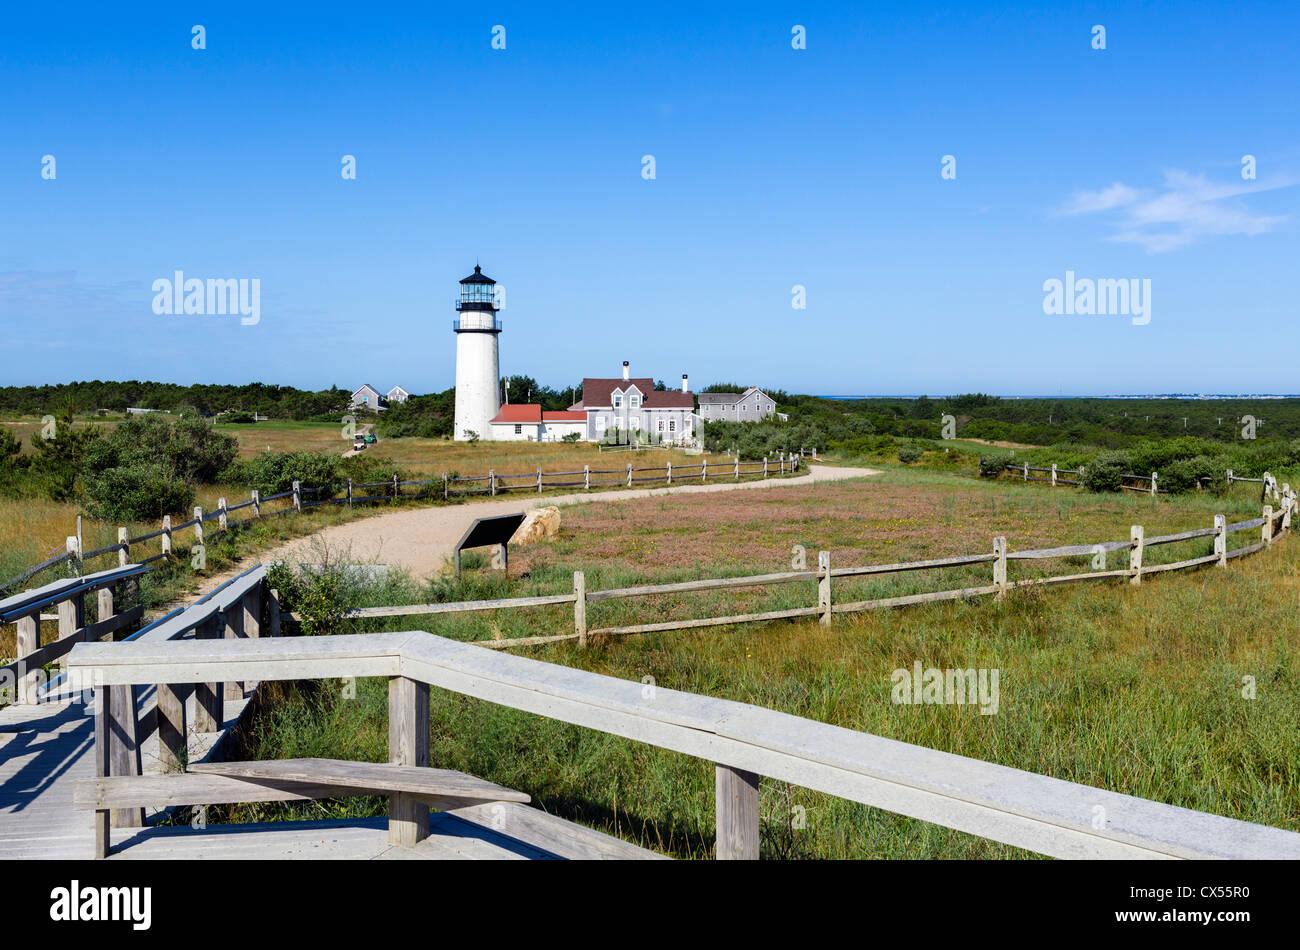 Cape Cod Highland Lighthouse, Cape Cod National Seashore, North Truro, Cape Cod, Massachusetts, USA - Stock Image